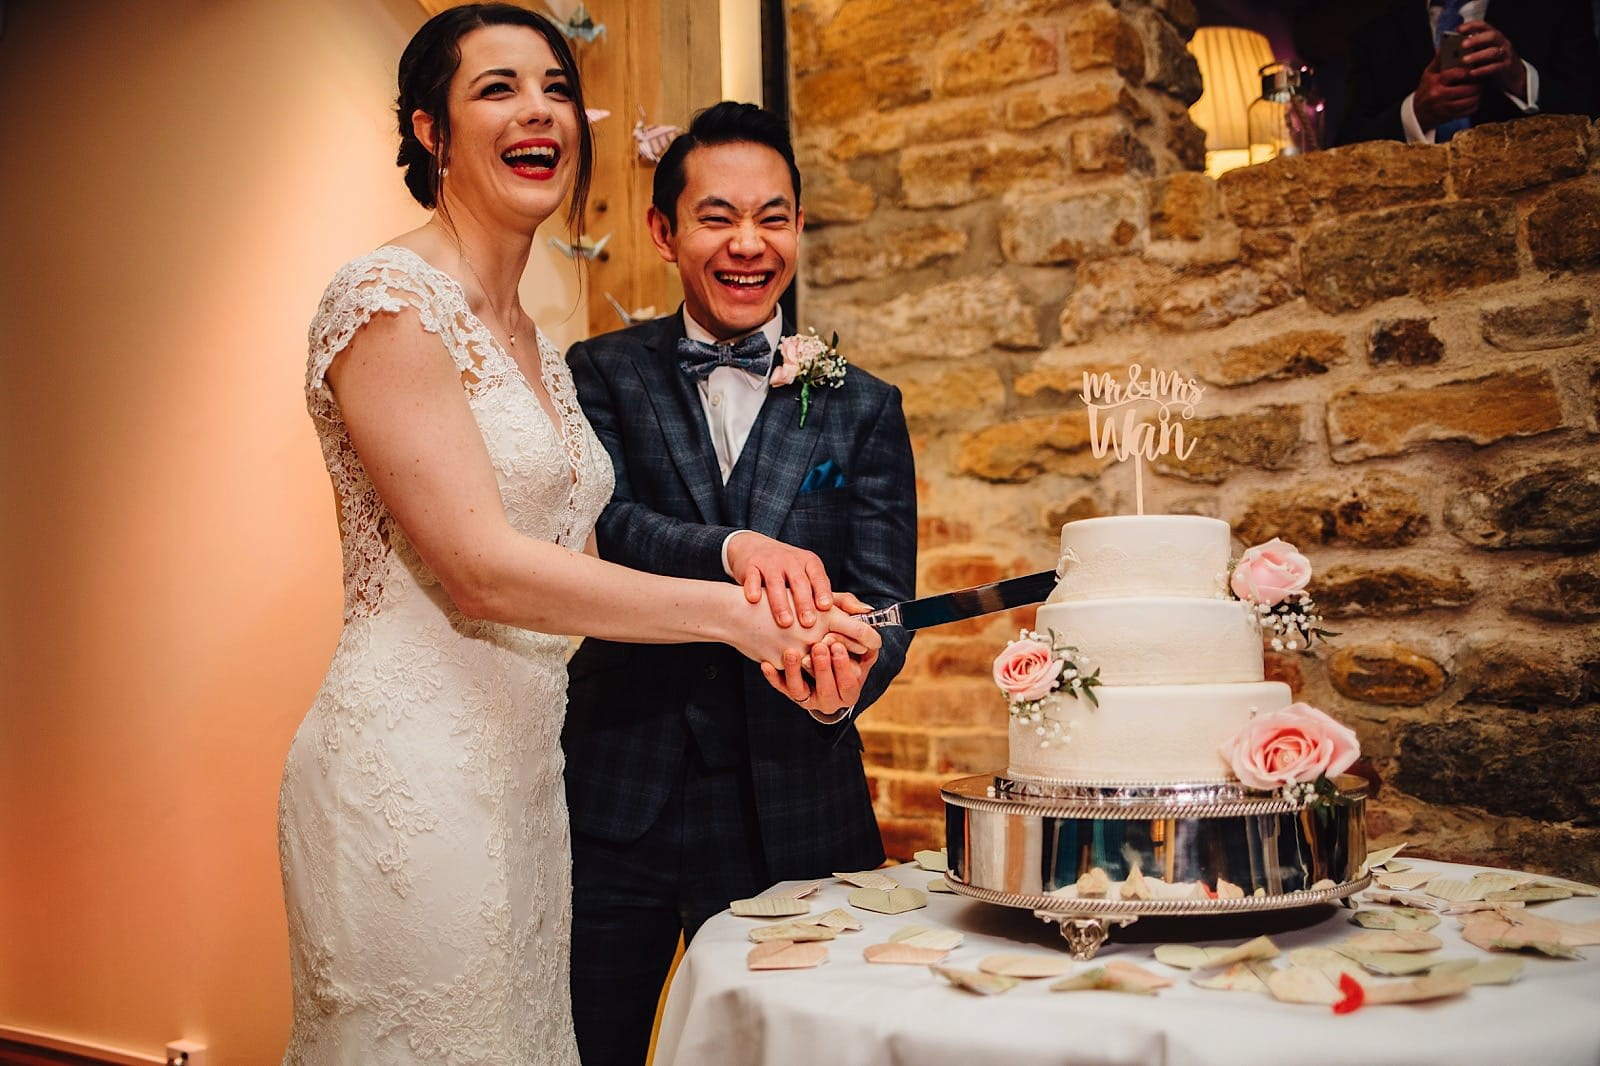 dodford manor northamptonshire wedding photography 0068